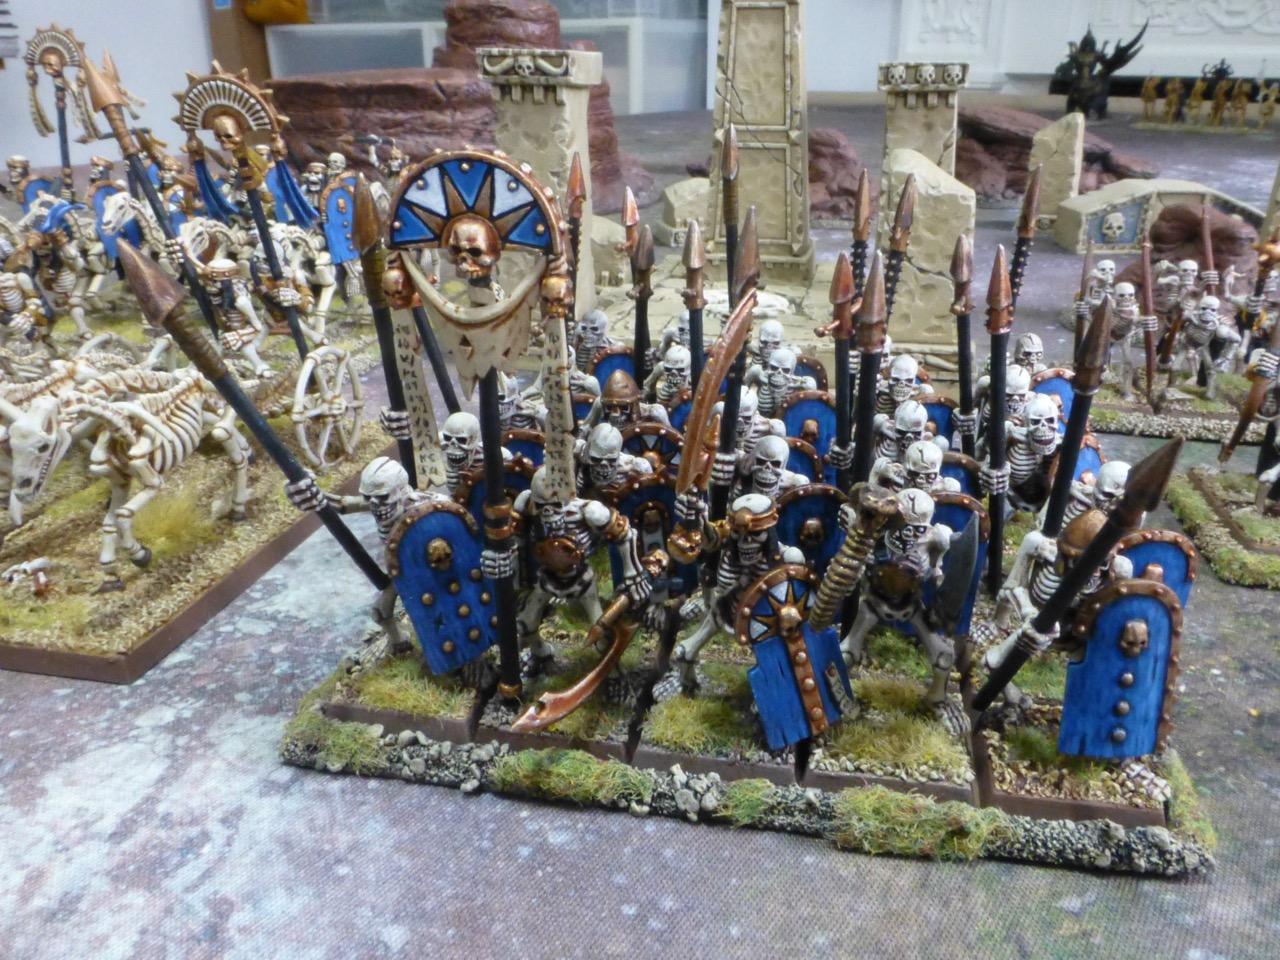 Skeleton spearmen with large blue shields